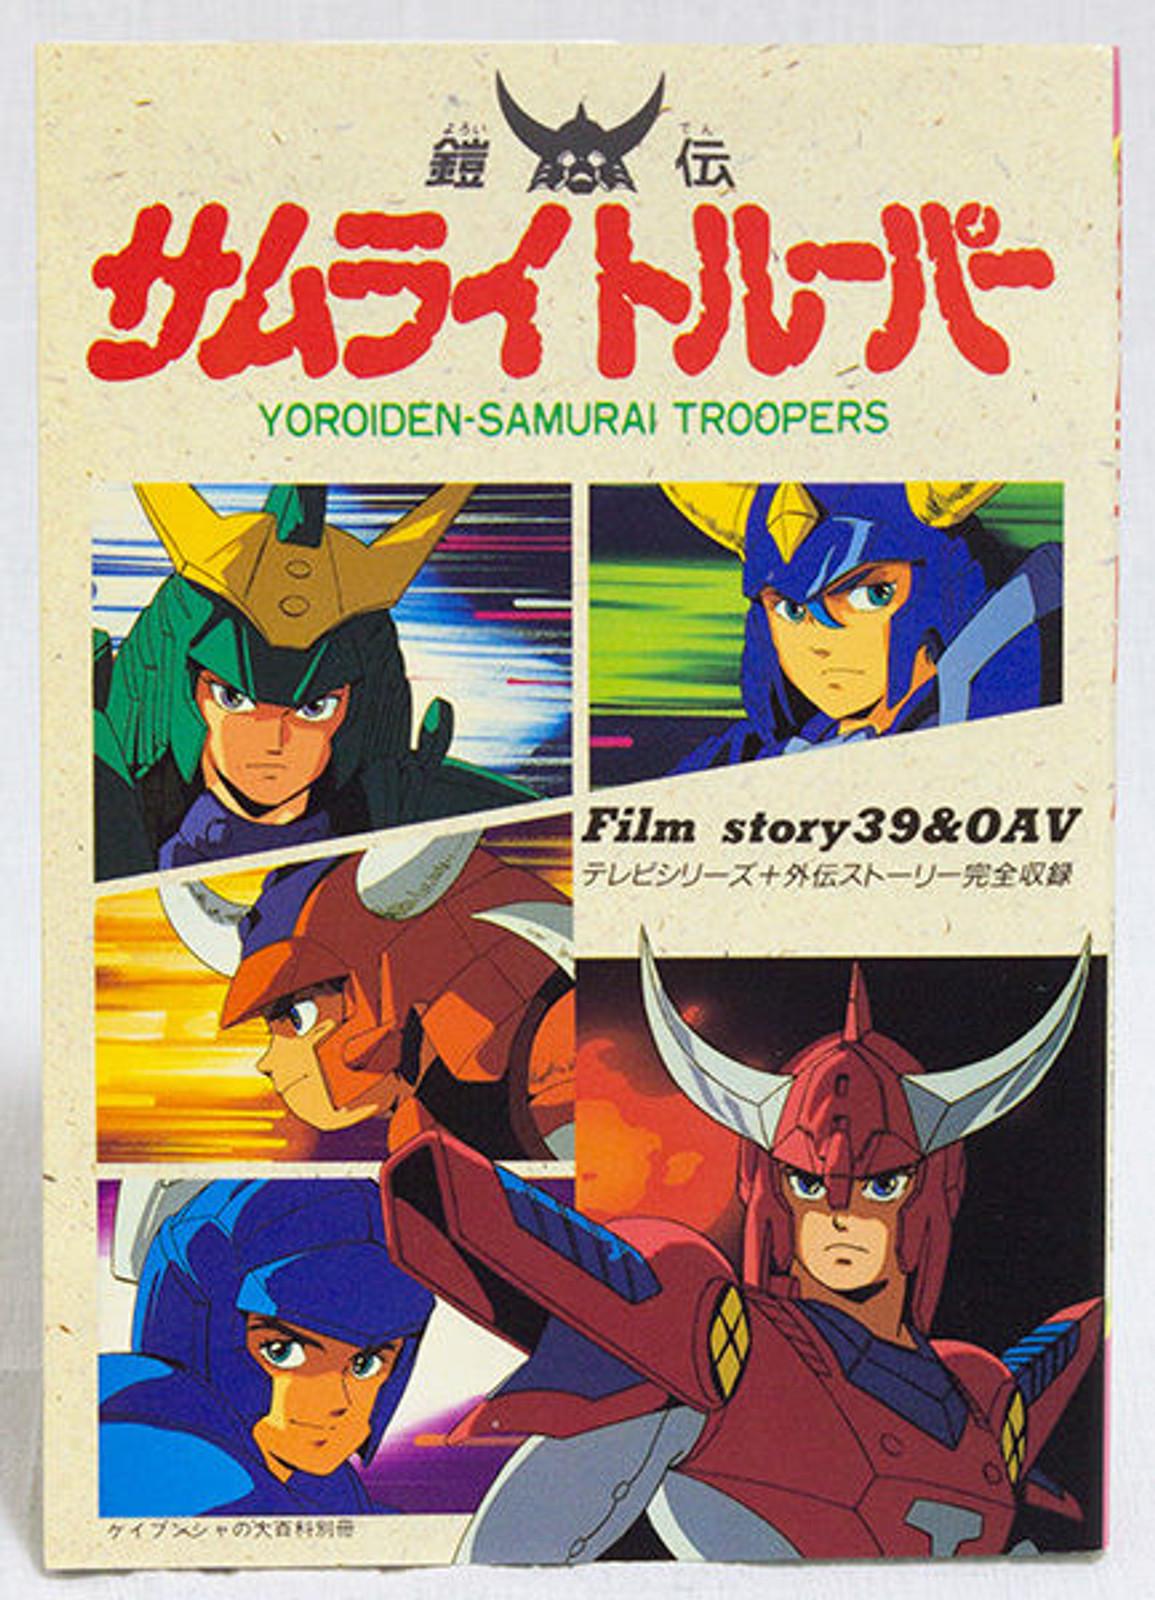 Ronin Warriors Samurai Troopers Film Story 39 and OAV Art Book Ronin Warriors JAPAN ANIME